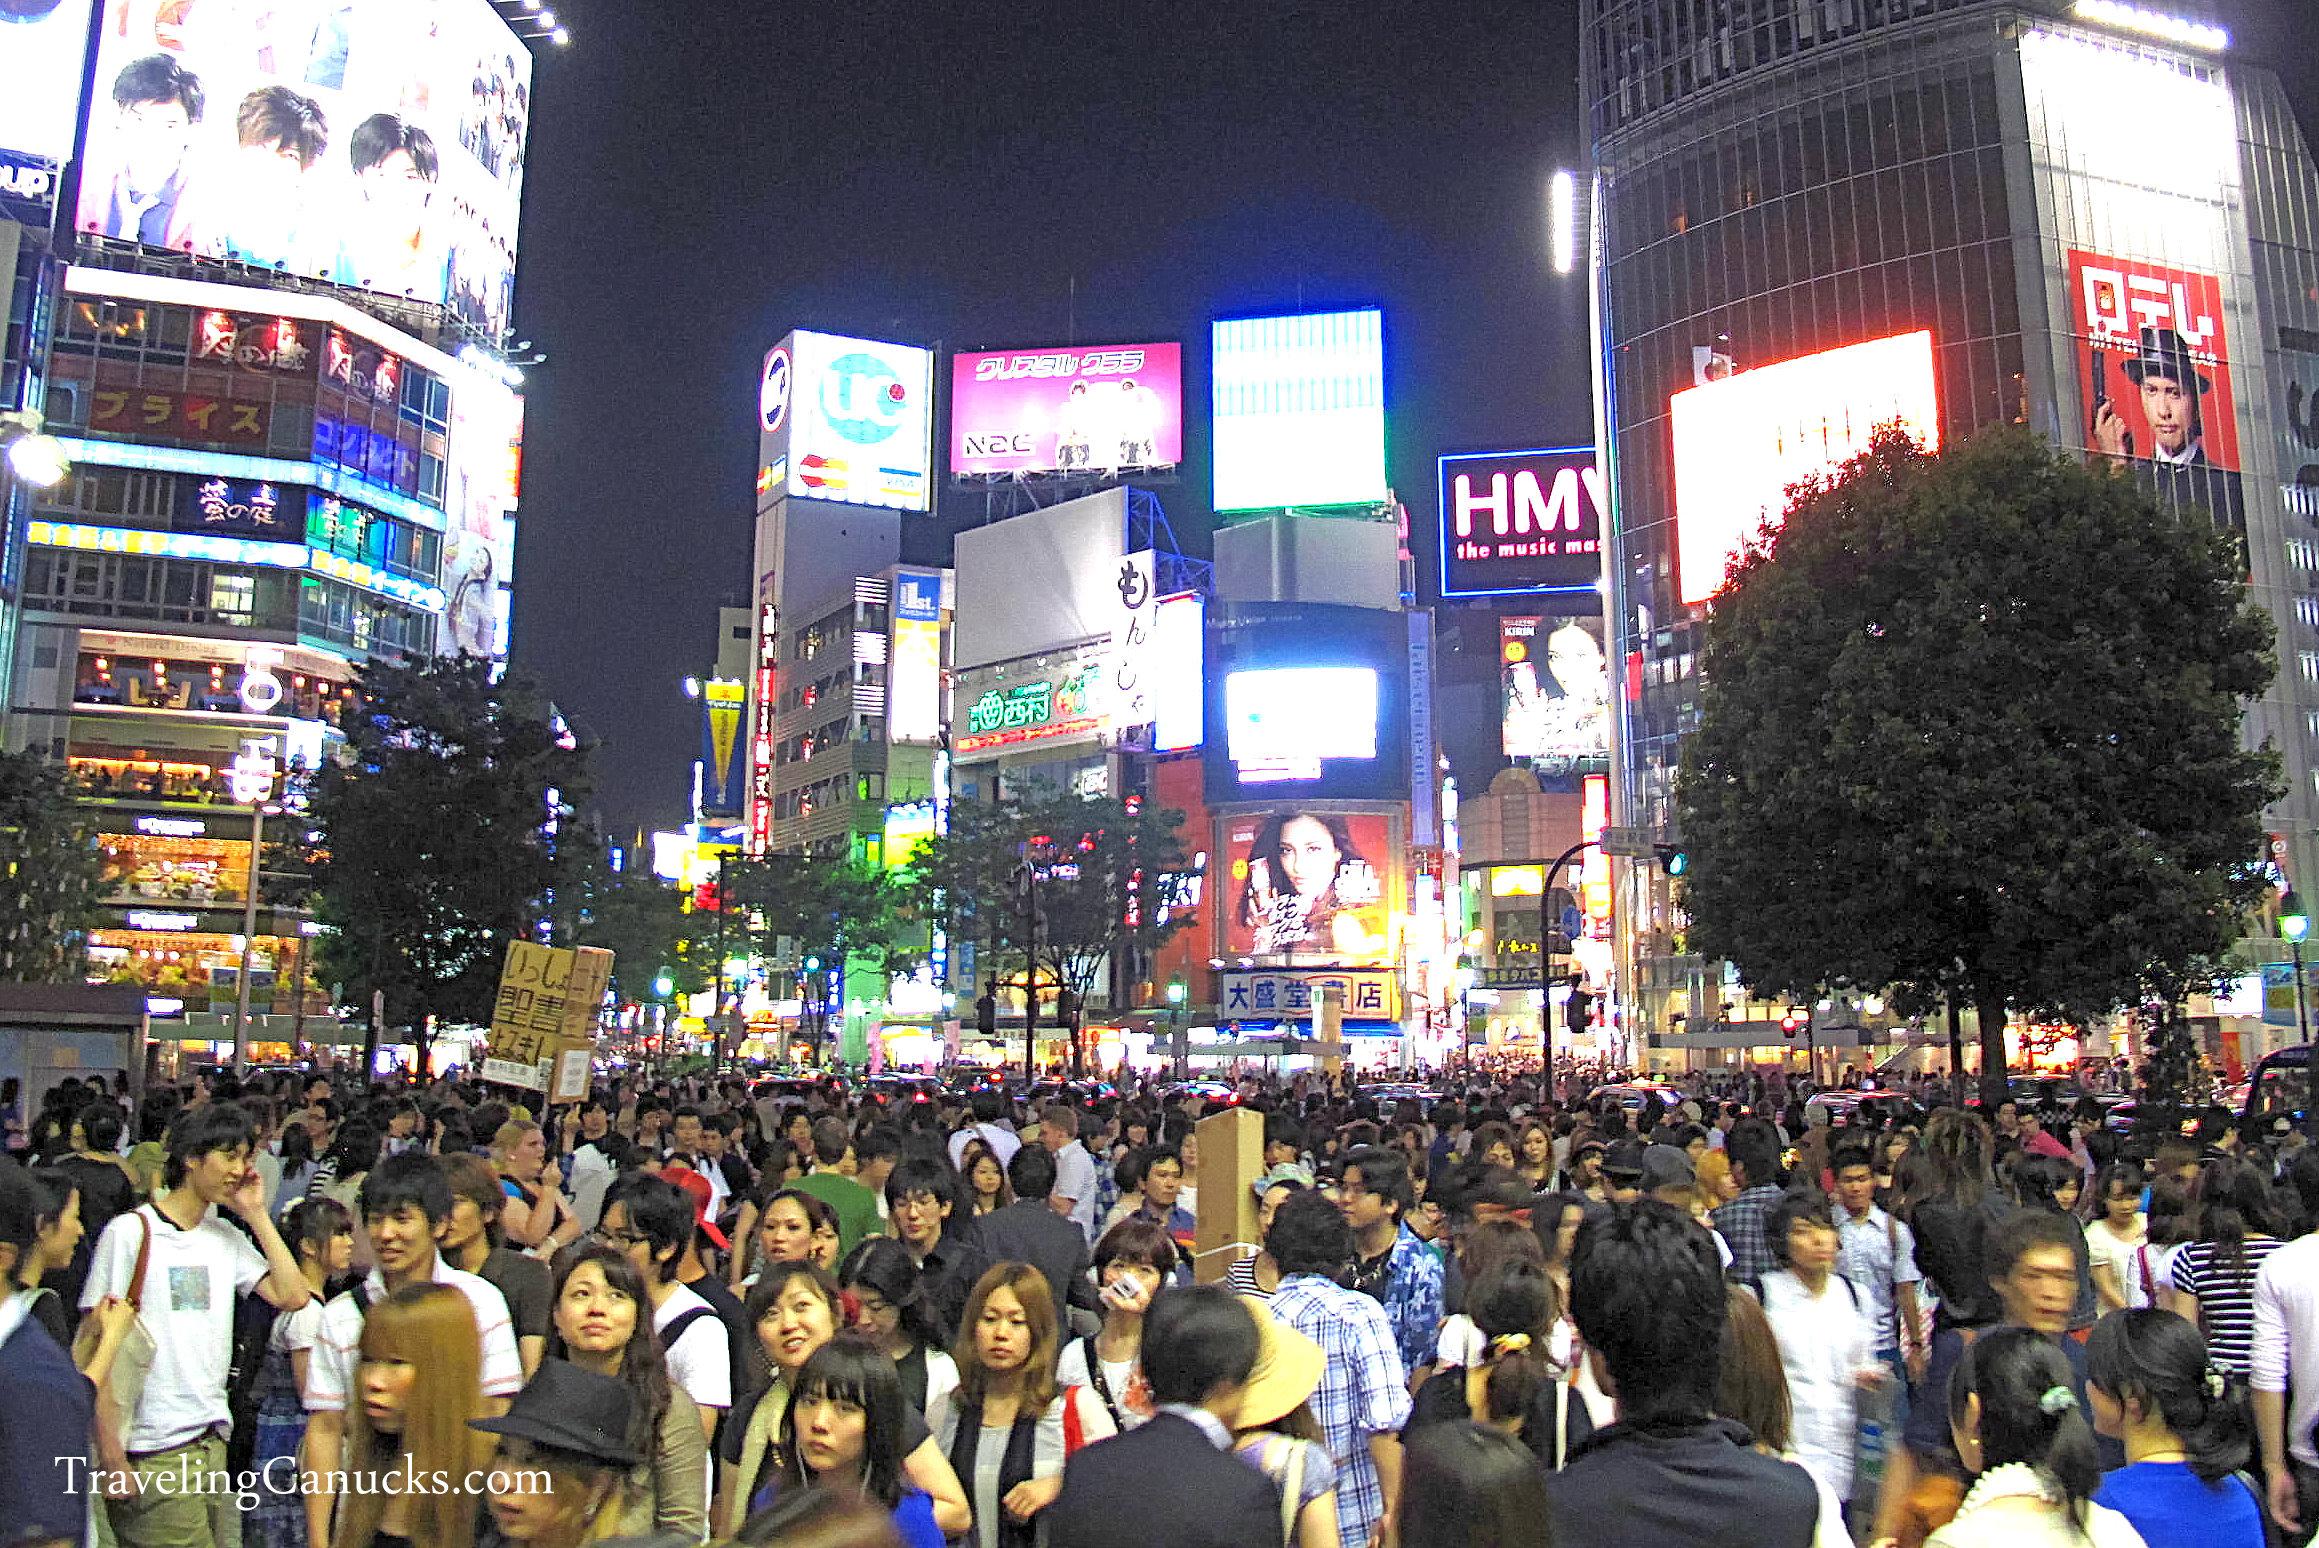 http://travelingcanucks.com/wp-content/uploads/2011/11/tokyo-shibuya-intersection.jpg